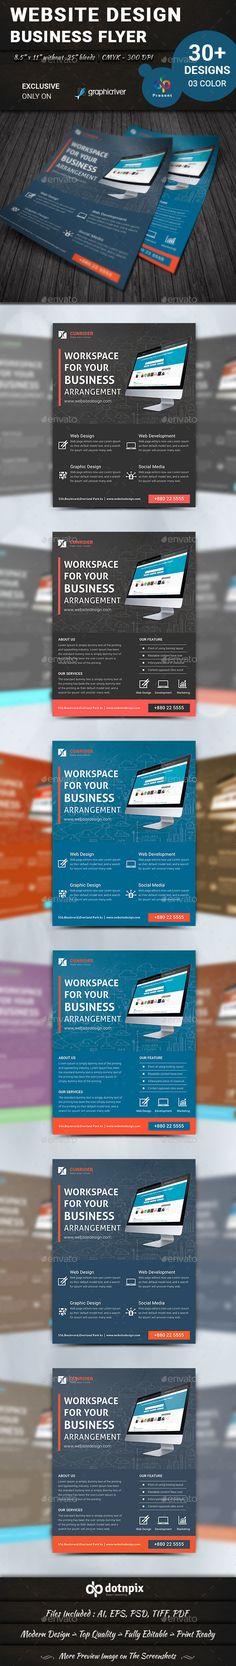 Website Design Flyer Template PSD. Download here: http://graphicriver.net/item/website-design-flyer-volume-3/15419651?ref=ksioks